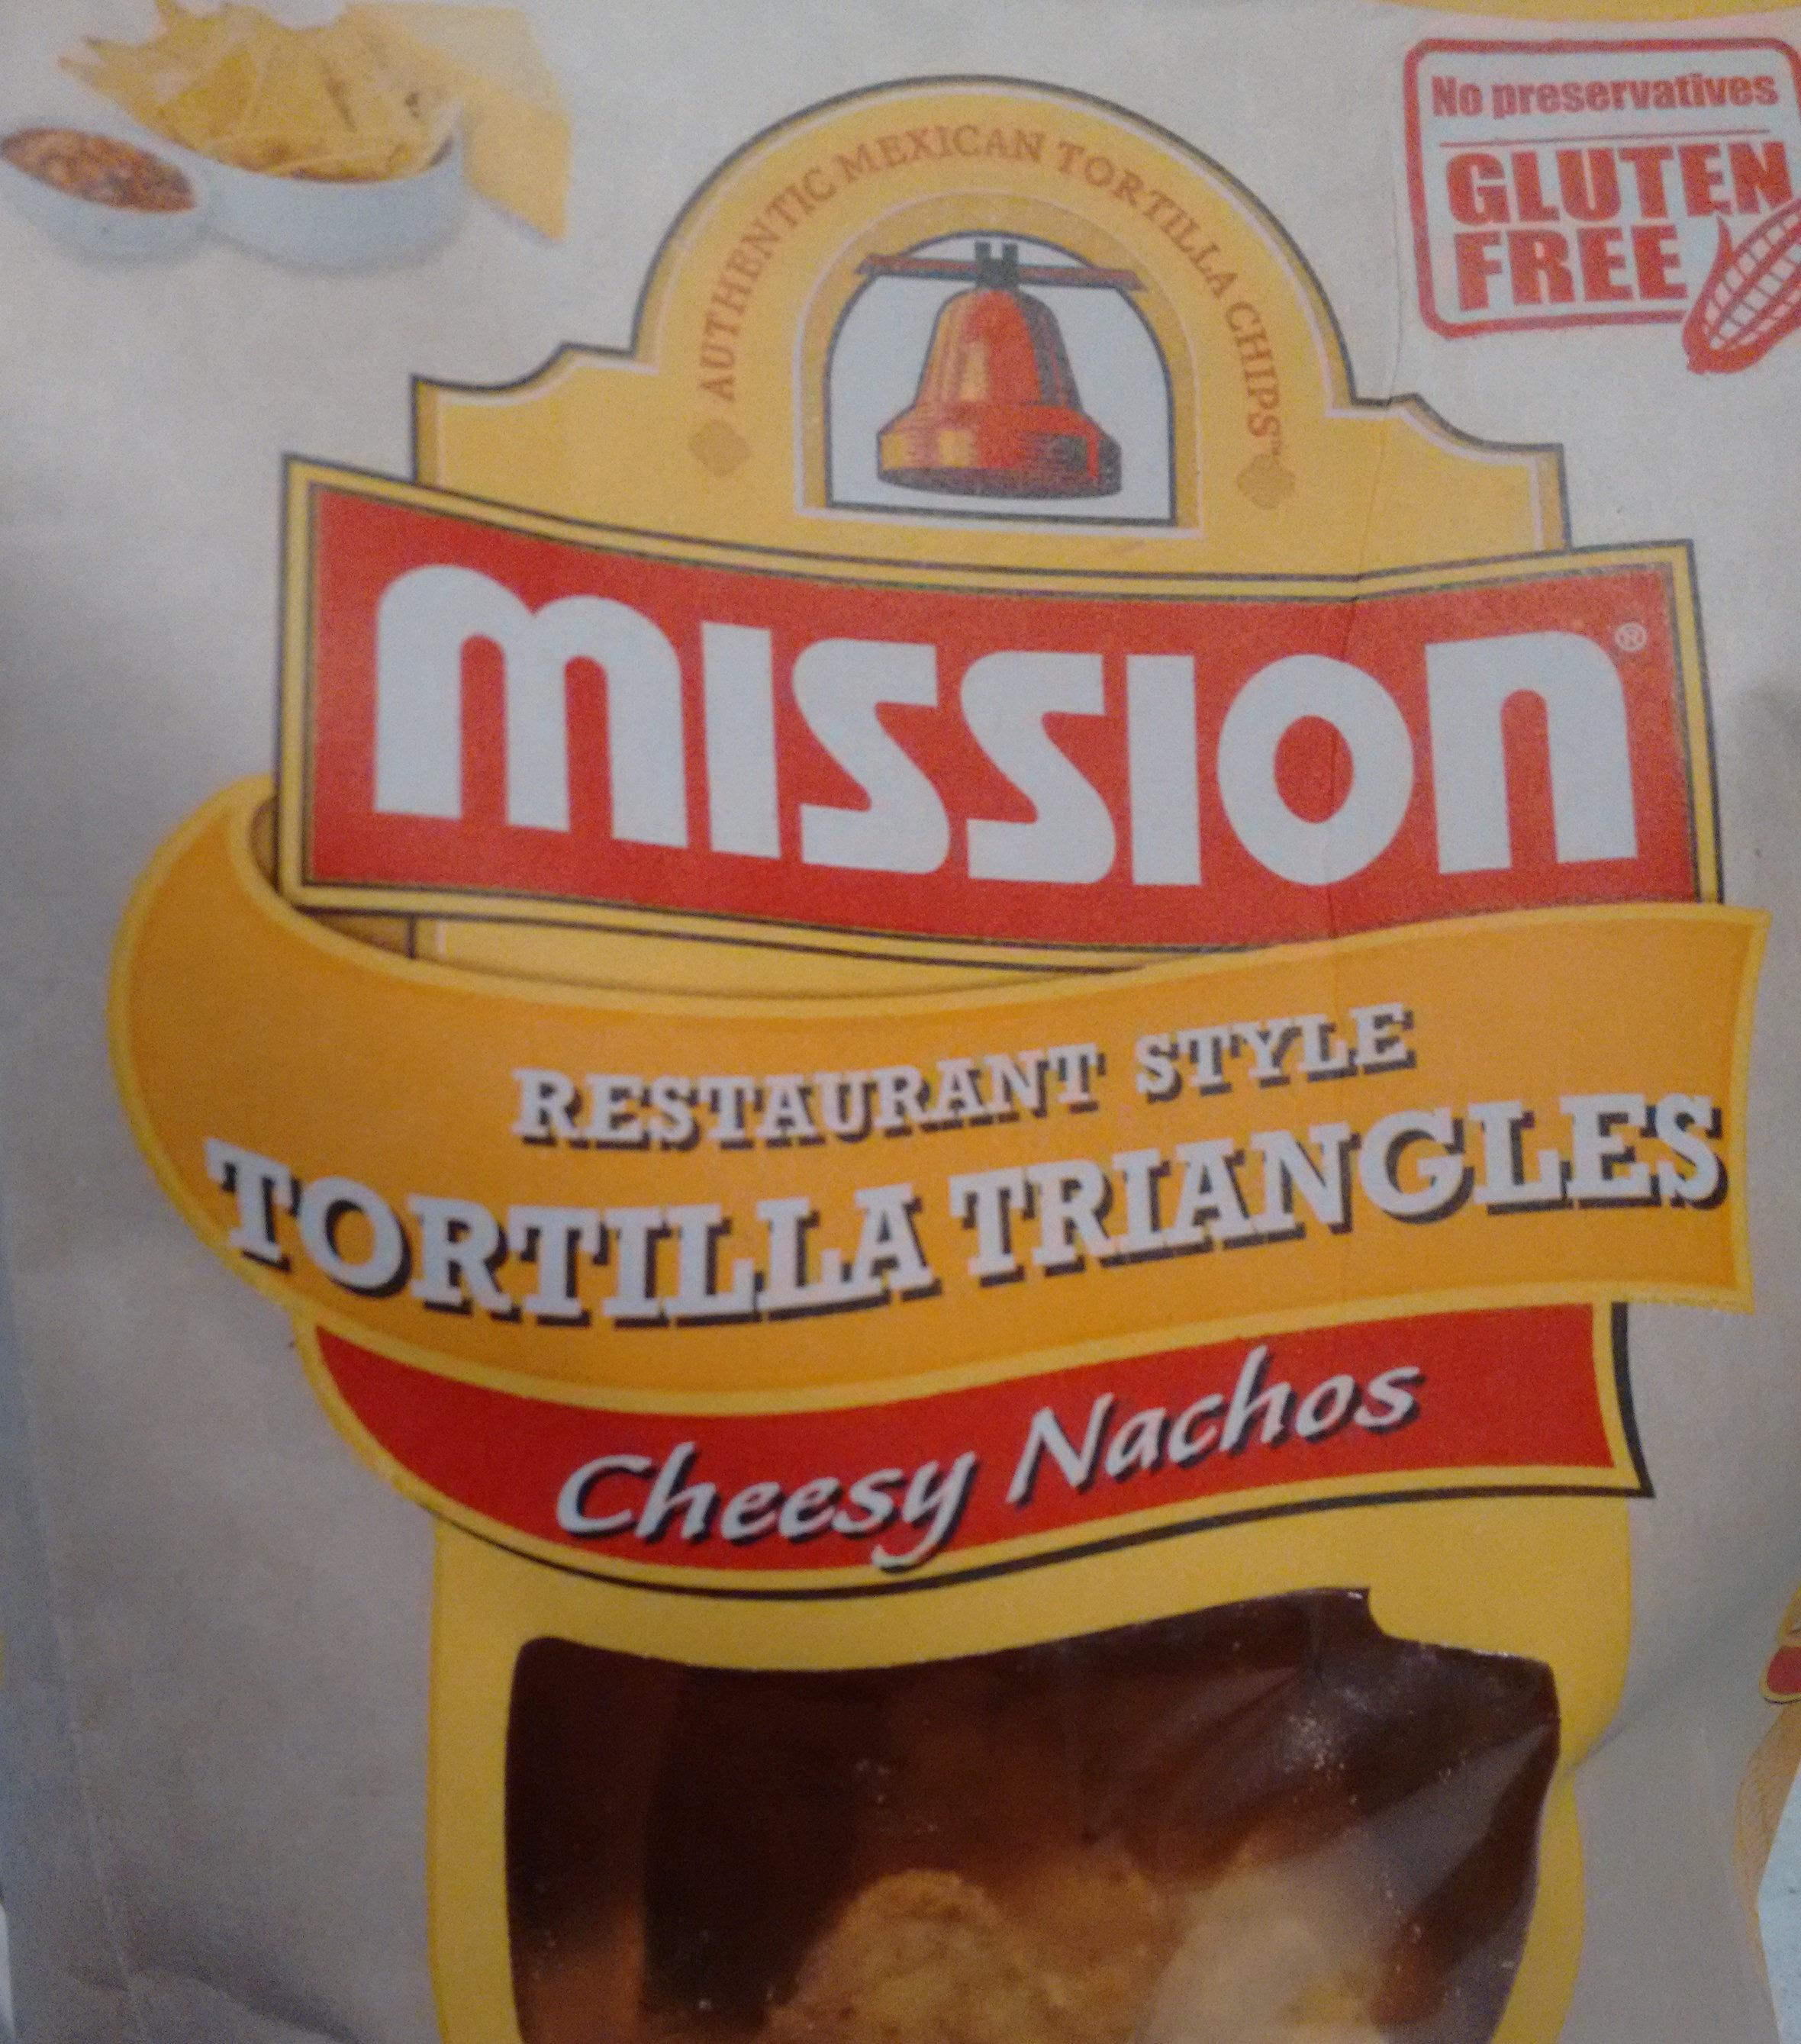 Tortilla Triangles (Cheesy Nachos) - Product - en